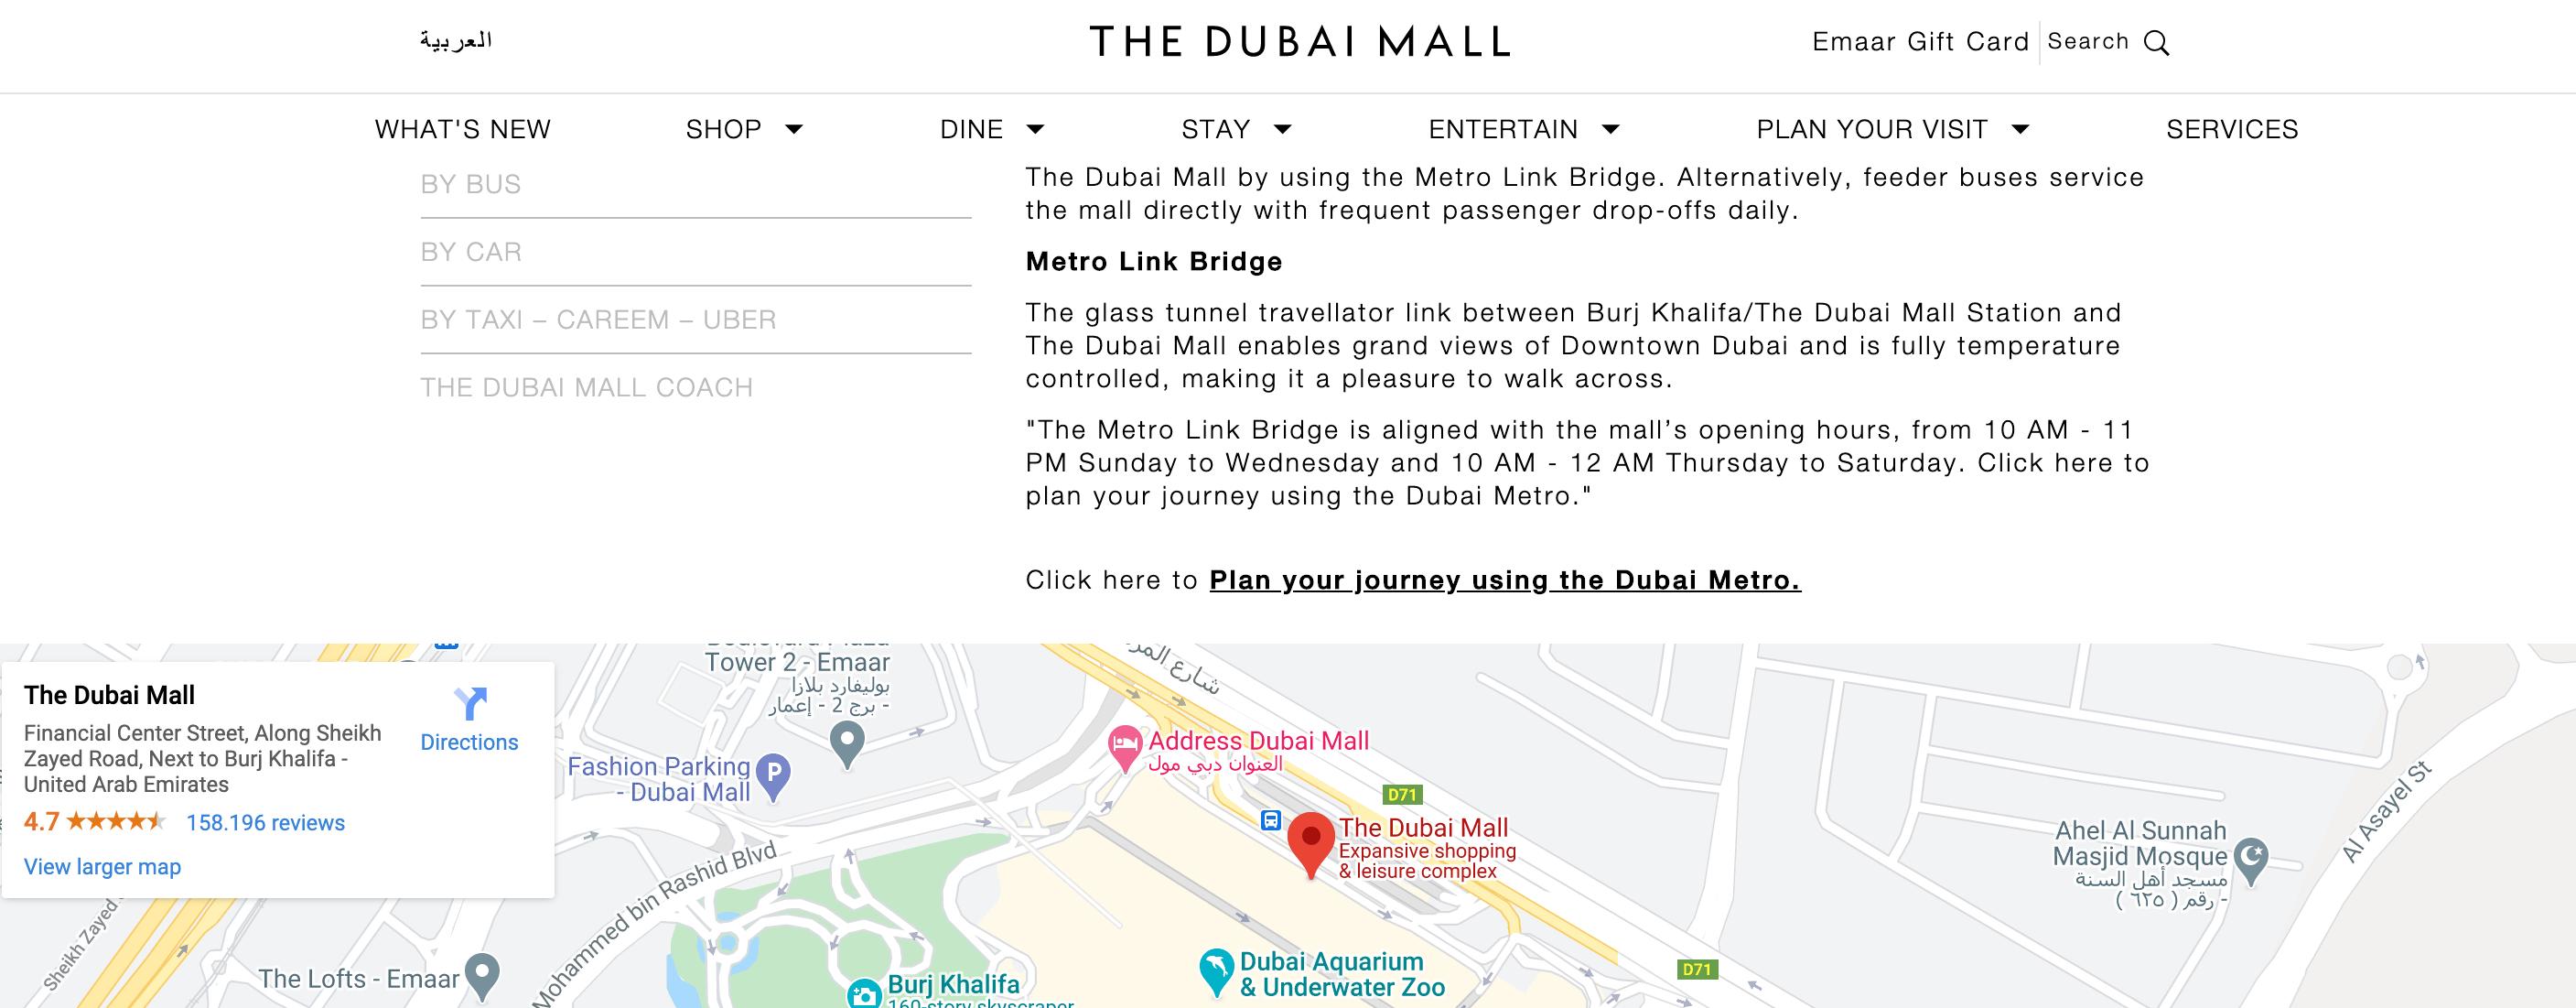 Dubai Mall Website address